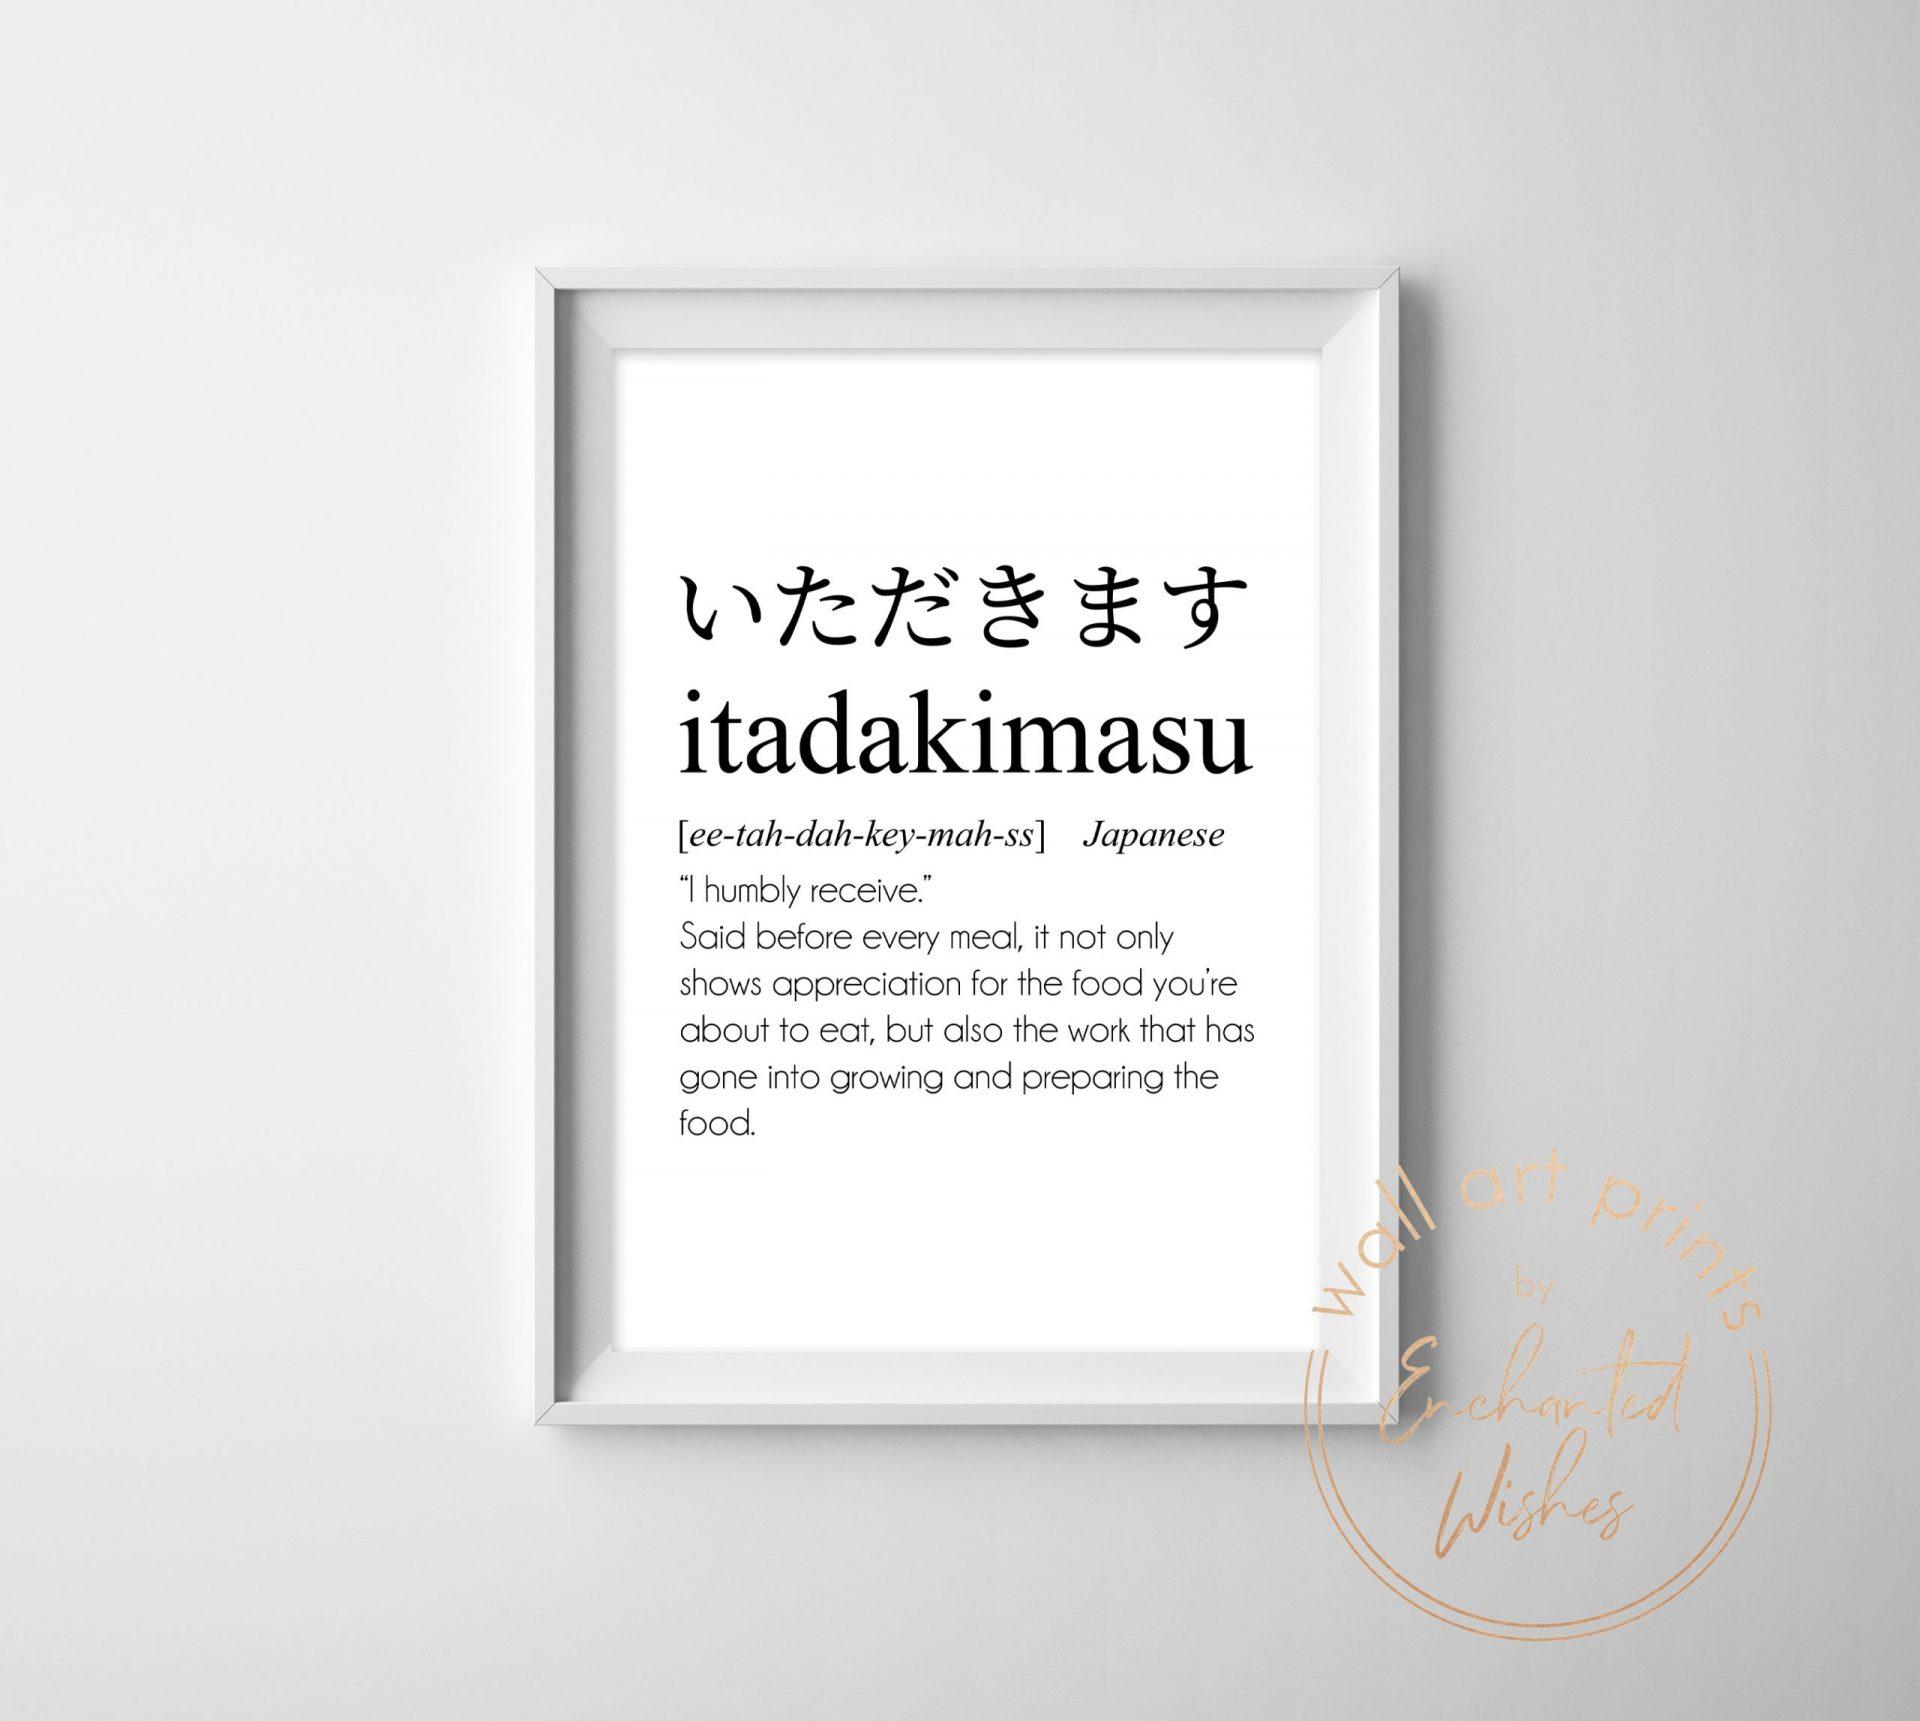 Itadakimasu definition print